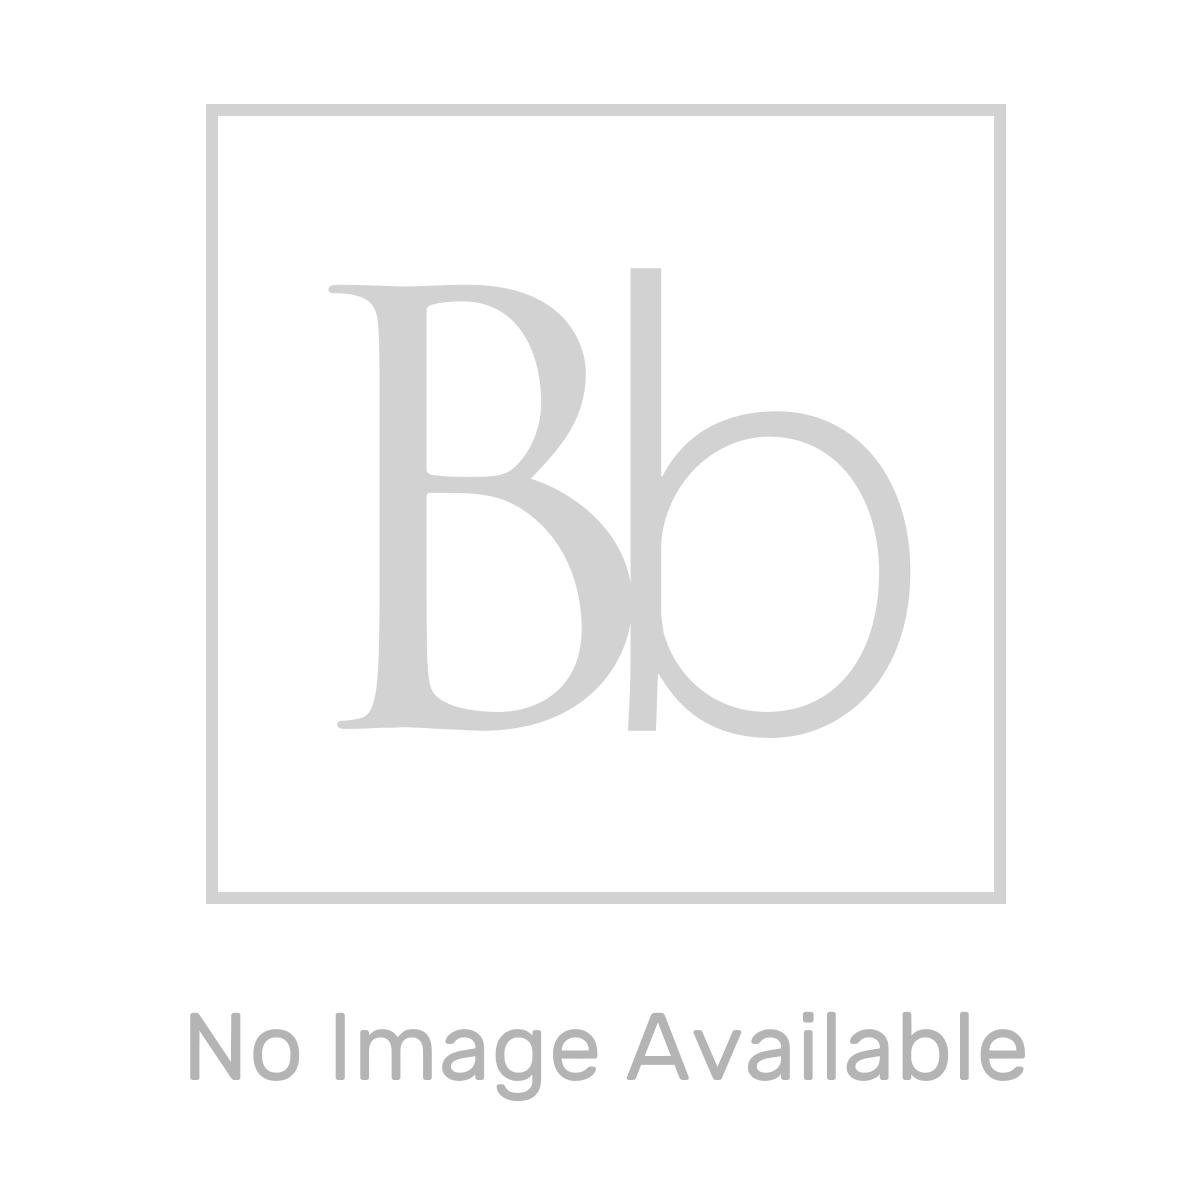 Frontline Blok Walnut Wooden Shower Bath Front Panel 1700mm - Right Hand